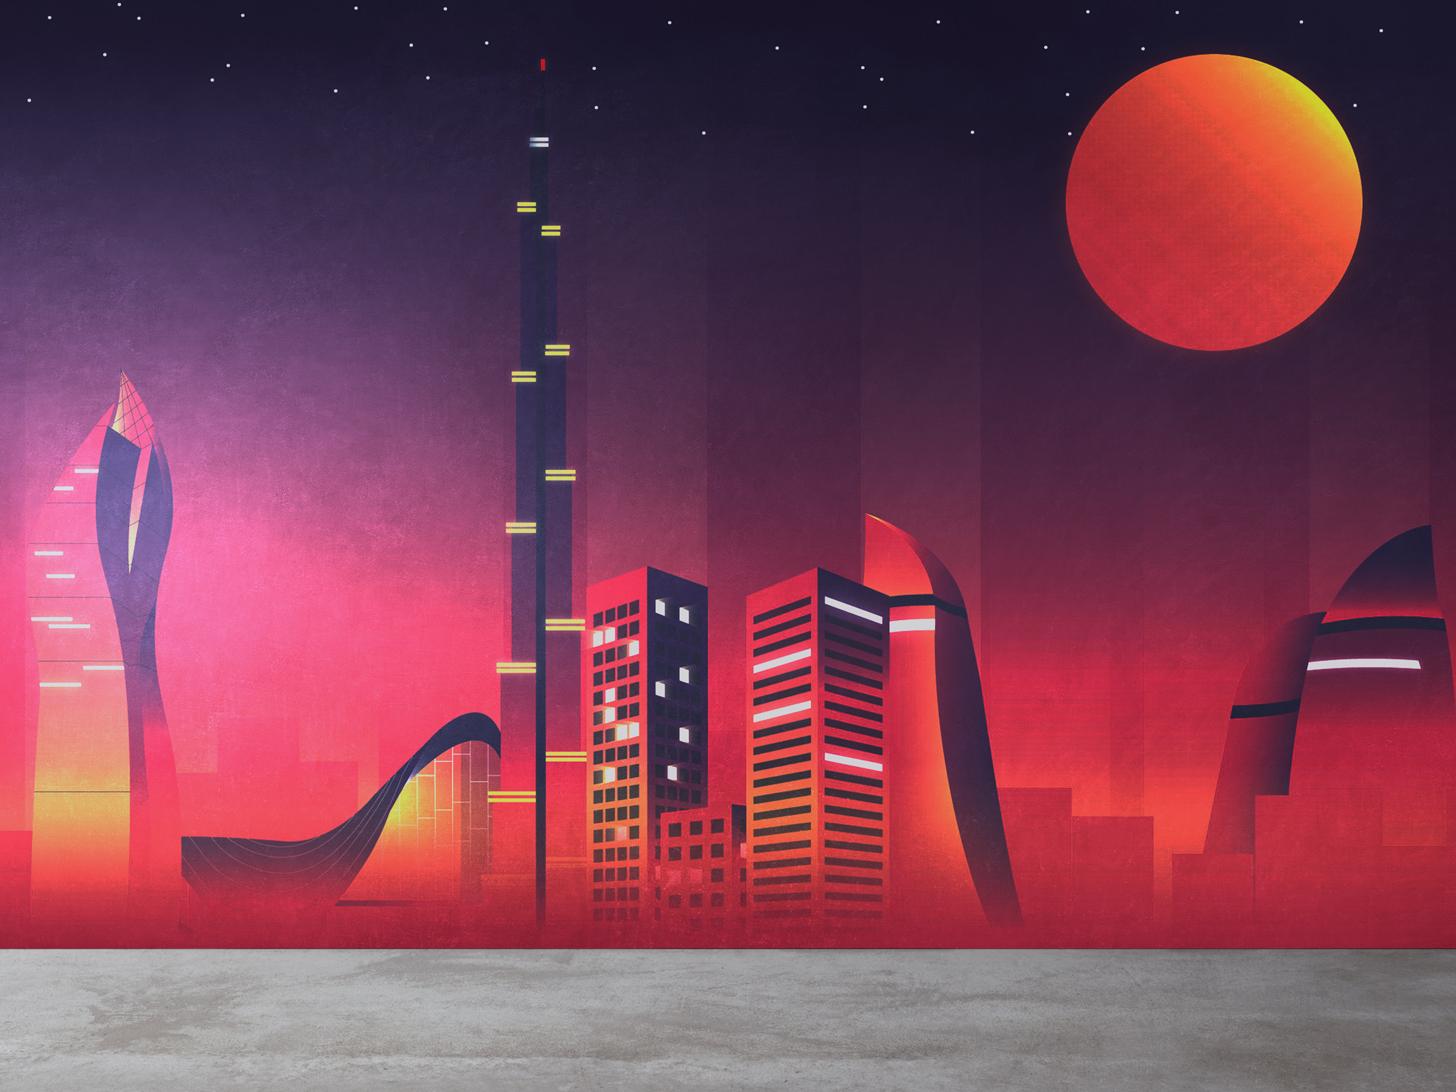 Baku City Poster city illustration illustrator wall poster city poster baku